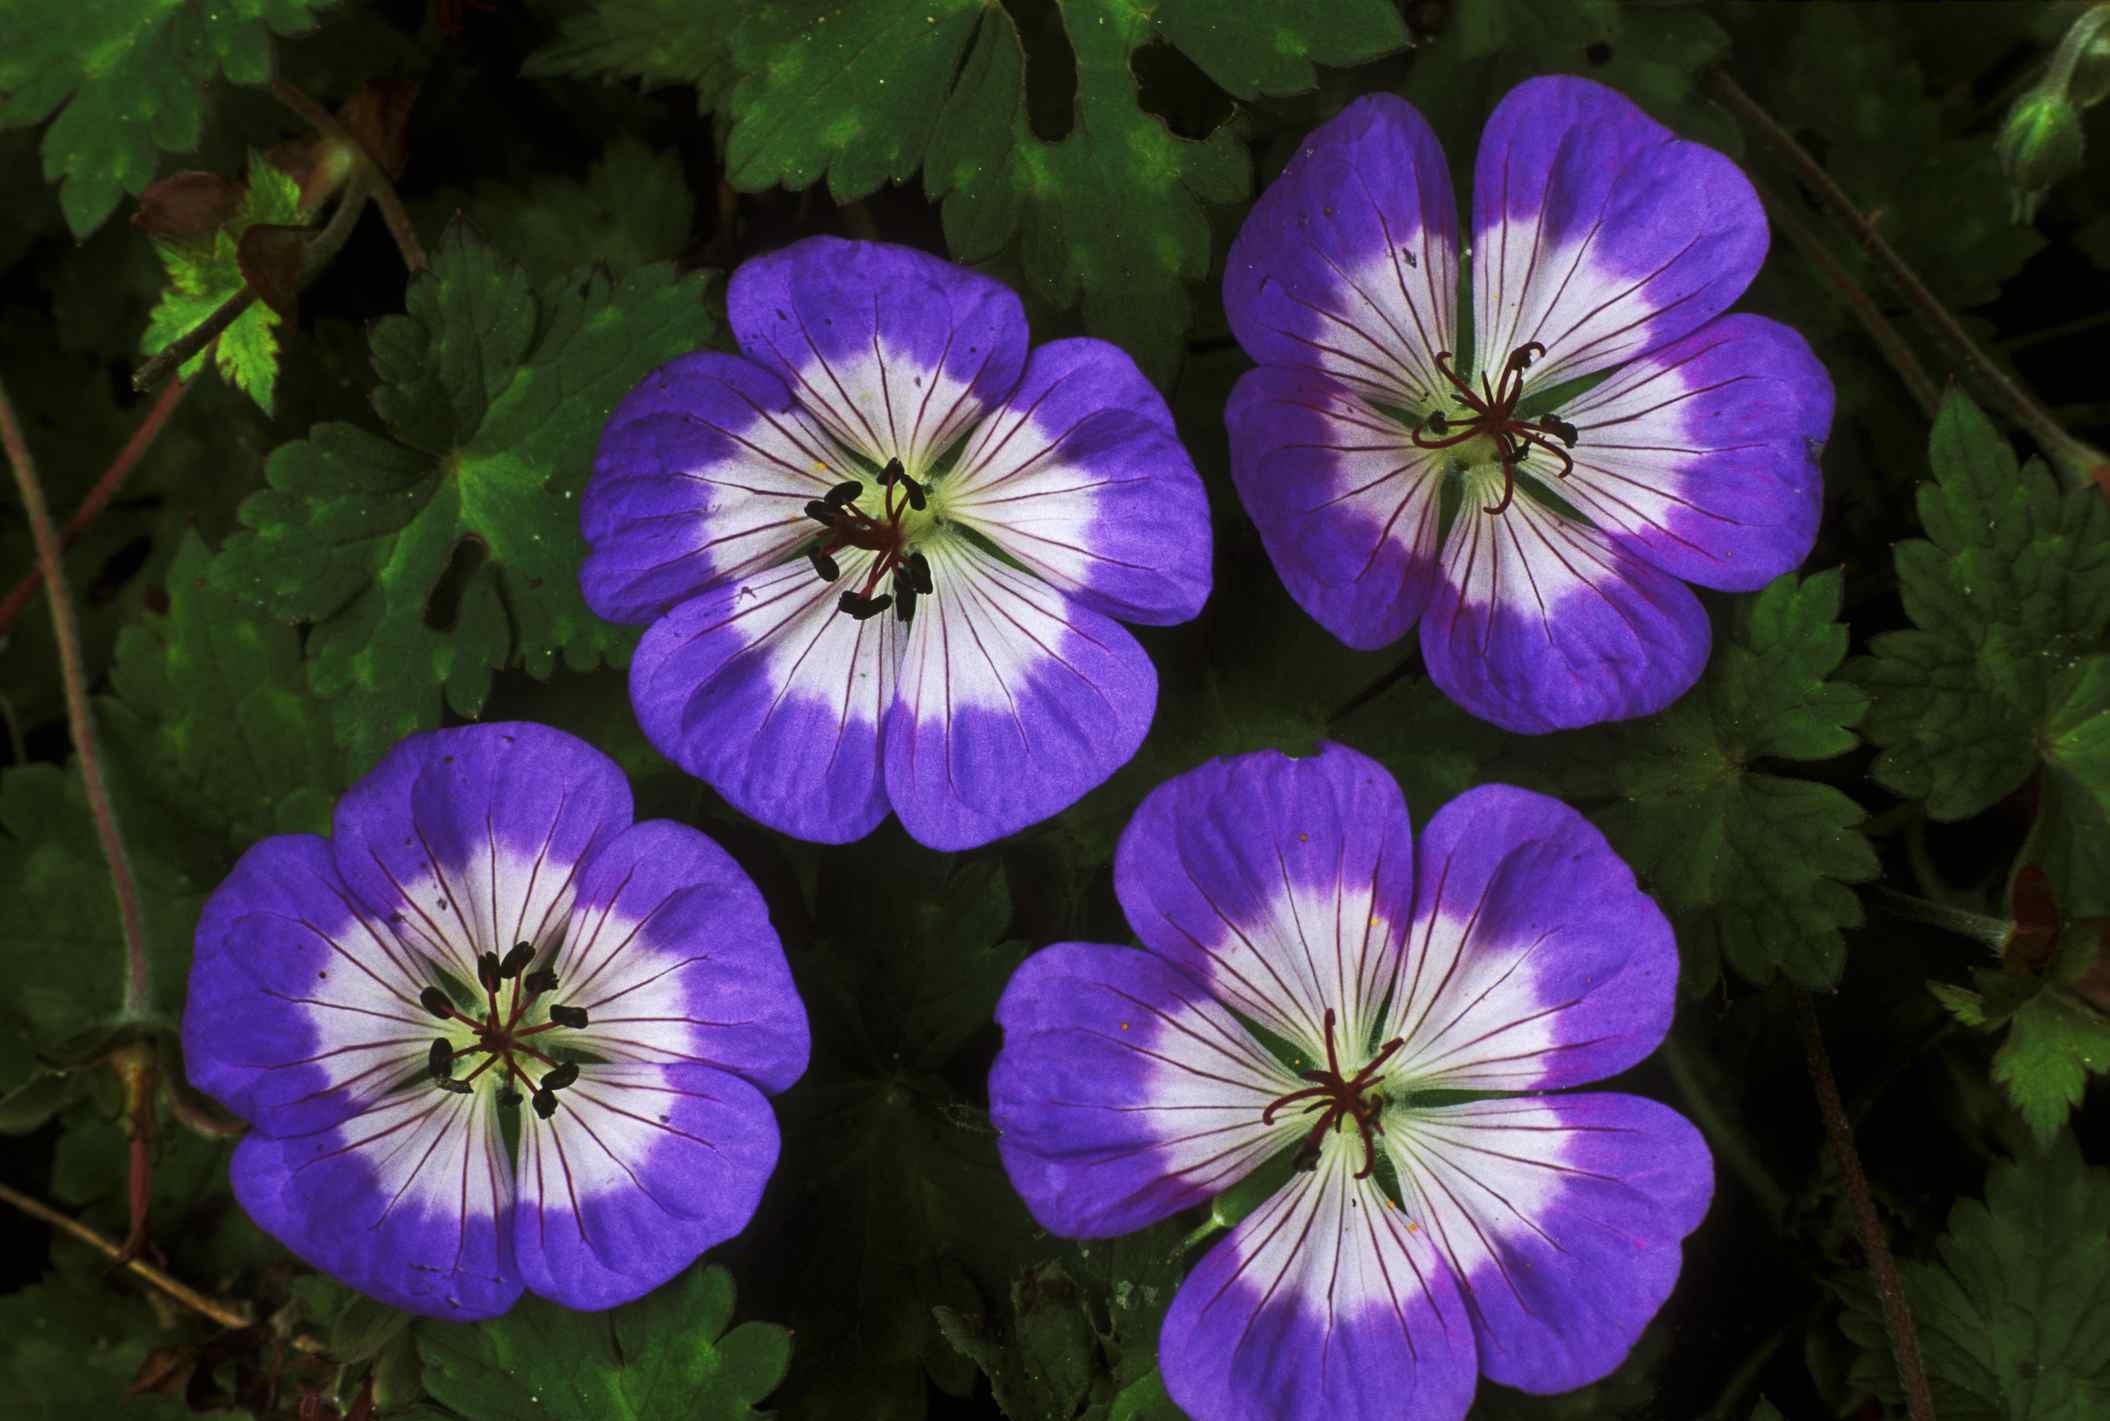 'Buxton Blue' geranium with bicolor petals